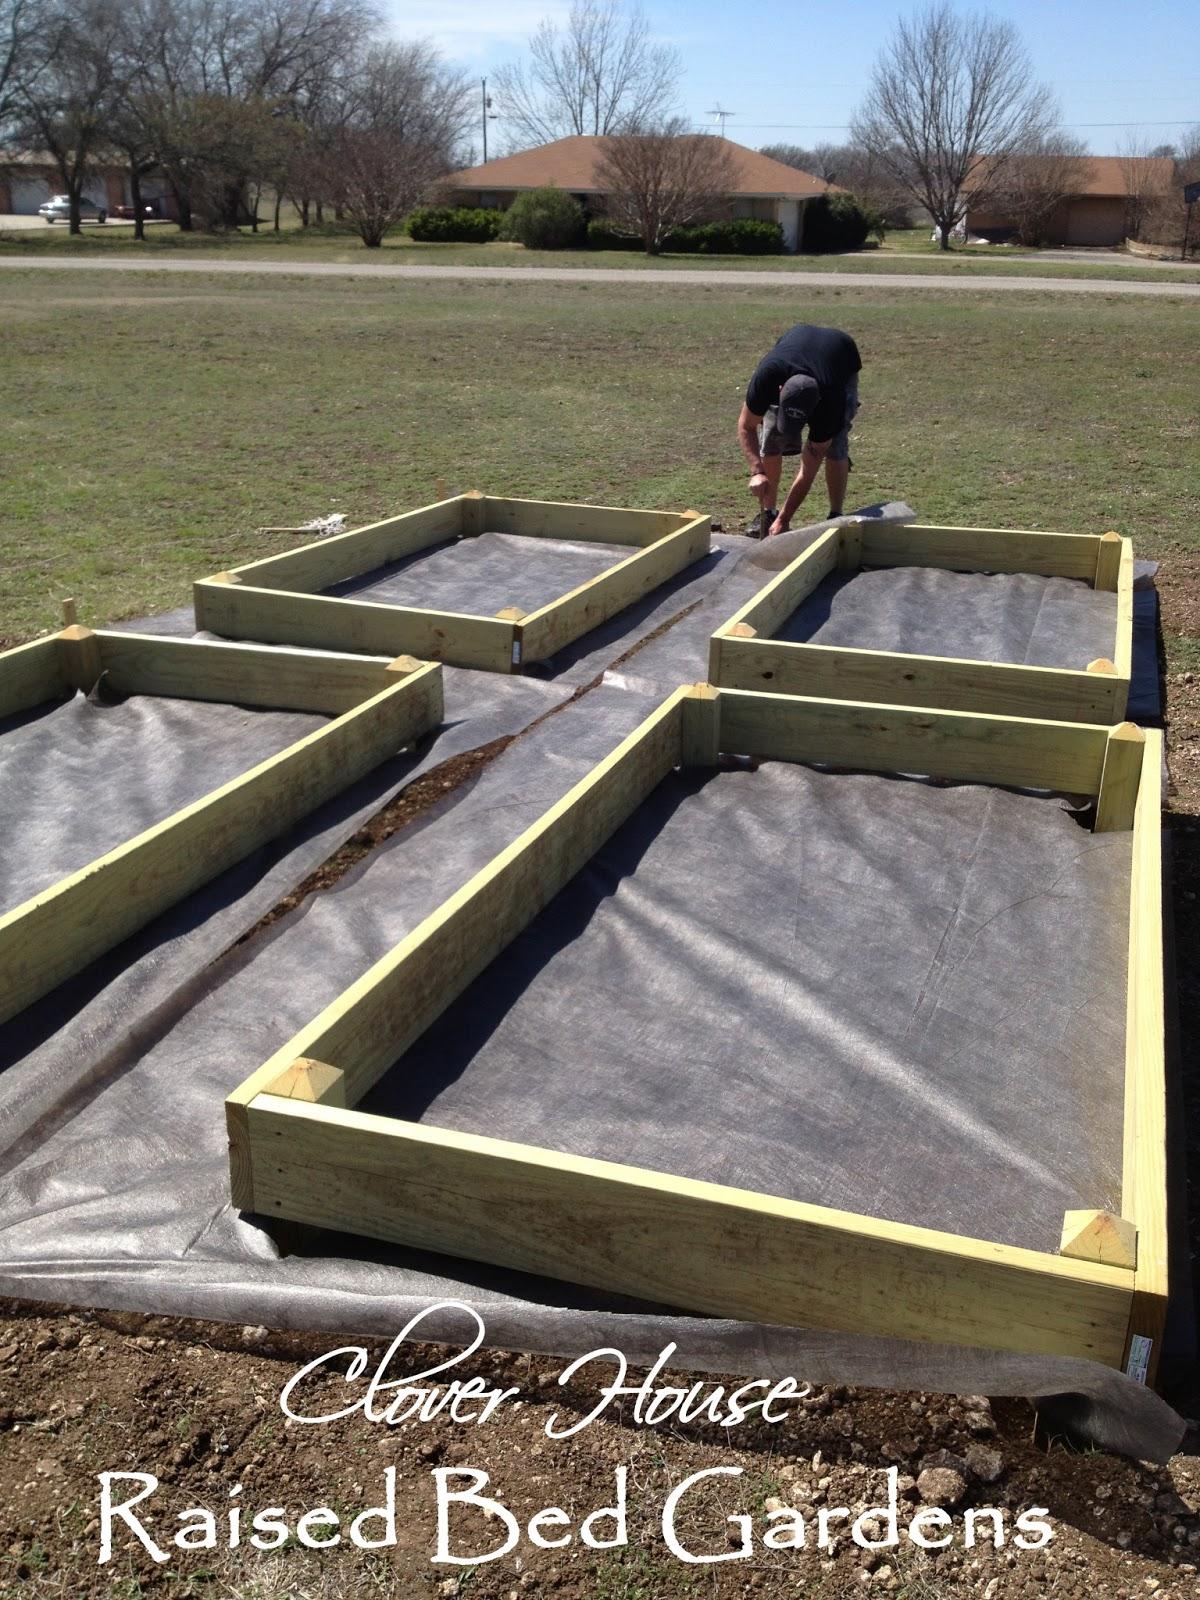 Clover House Raised Bed Garden Part 2